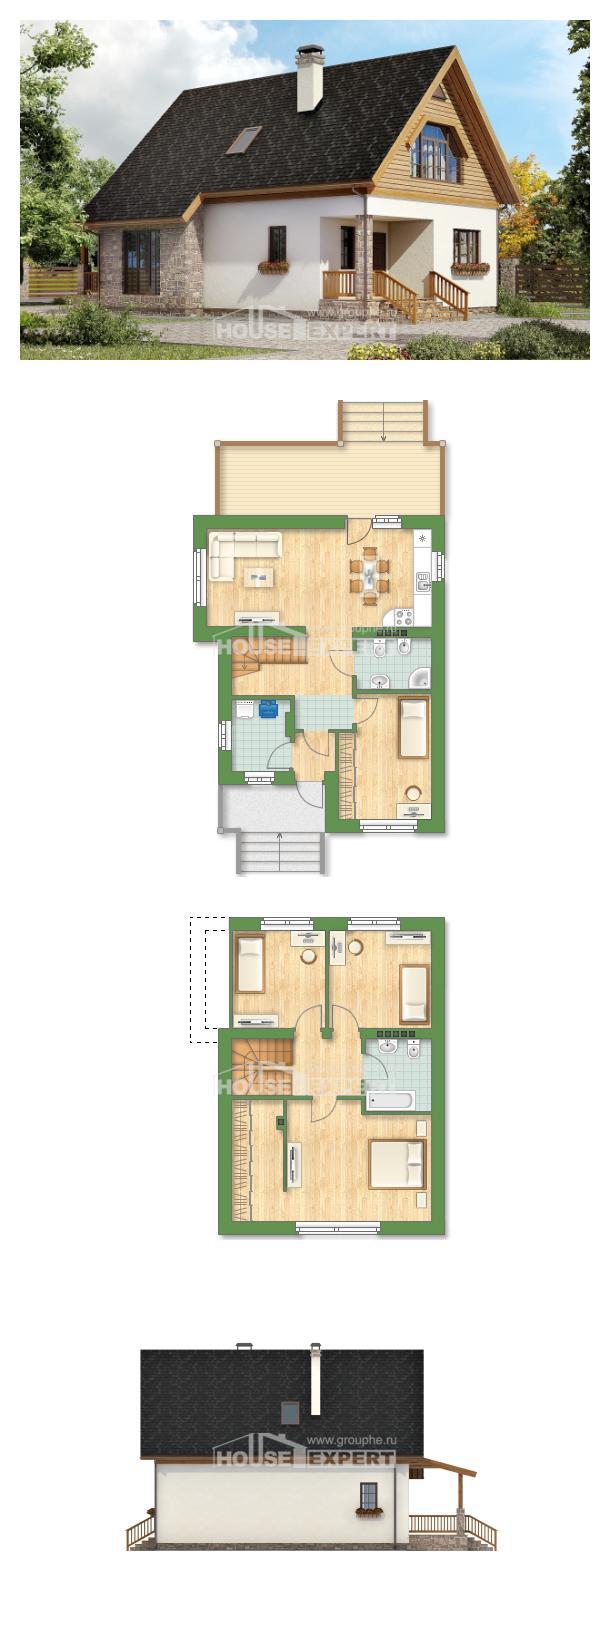 Projekt domu 140-001-L   House Expert